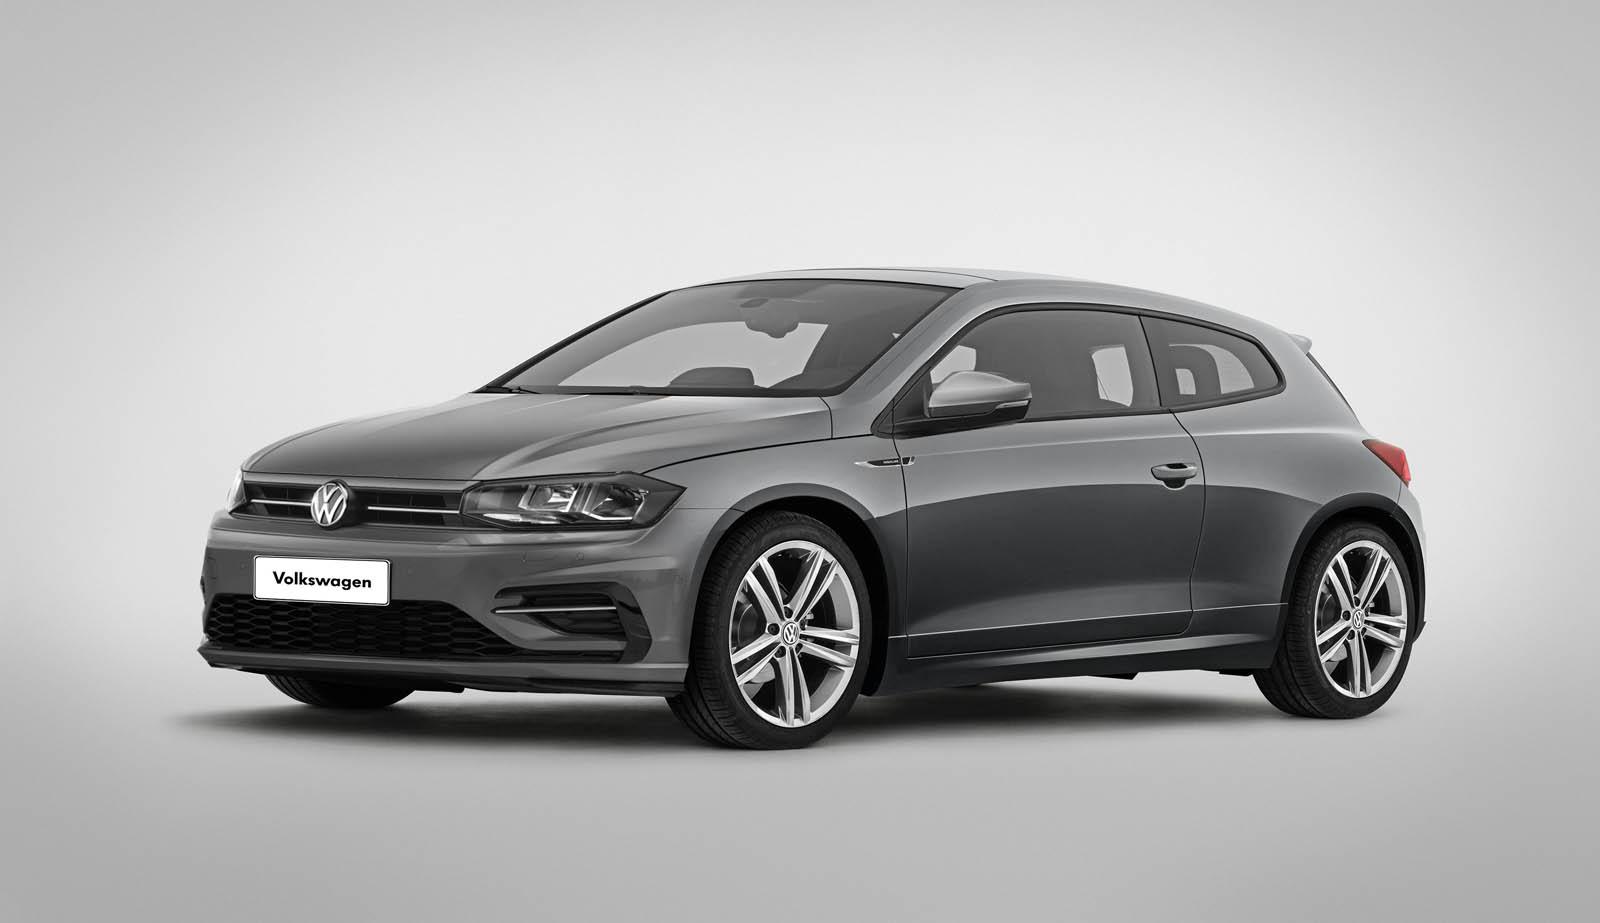 The German Car Blog – The latest news on great German cars.